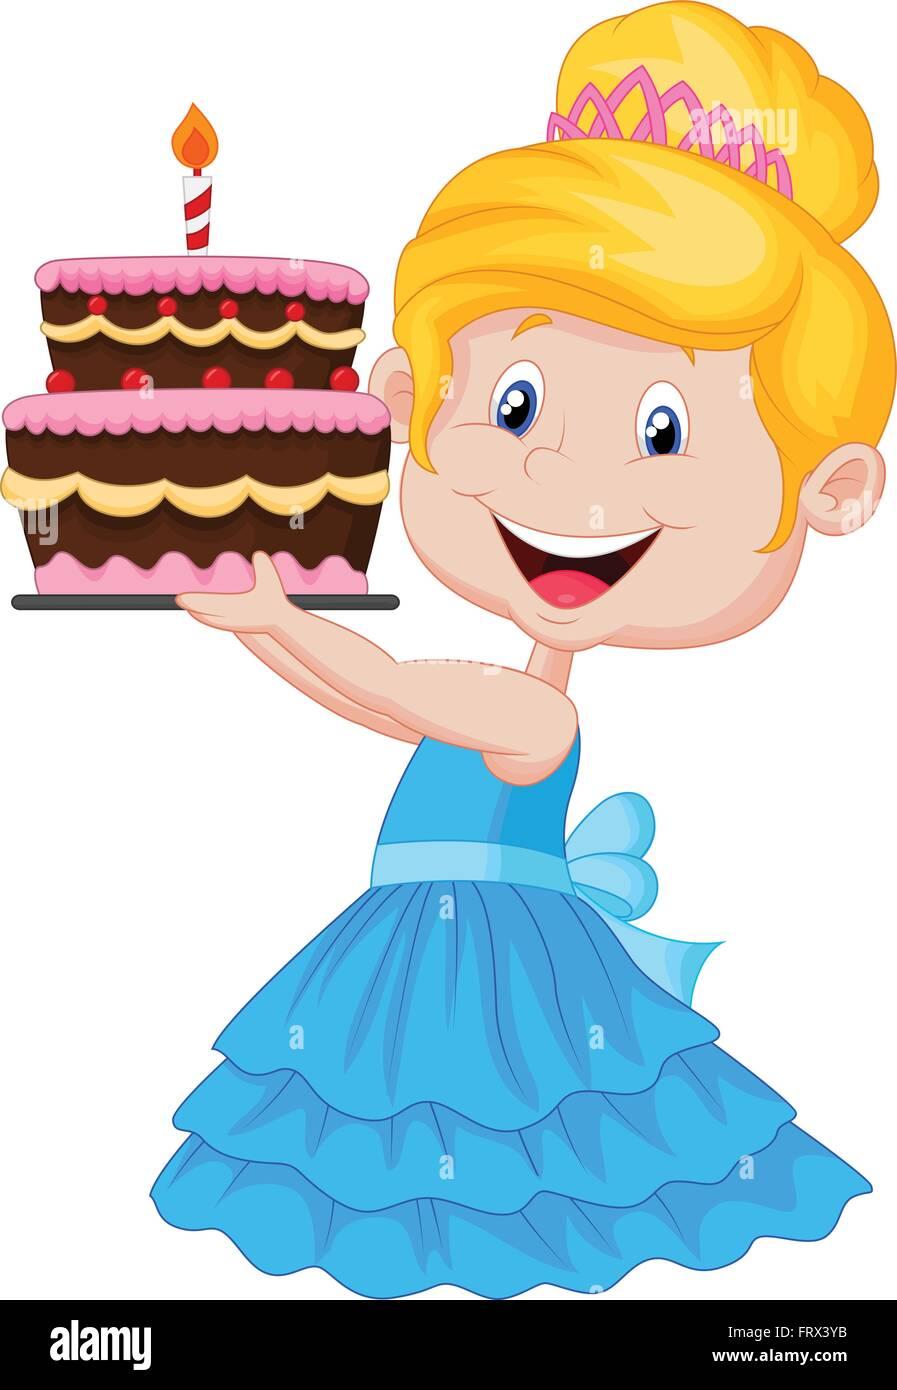 Awe Inspiring Little Girl With Birthday Cake Stock Vector Art Illustration Funny Birthday Cards Online Elaedamsfinfo